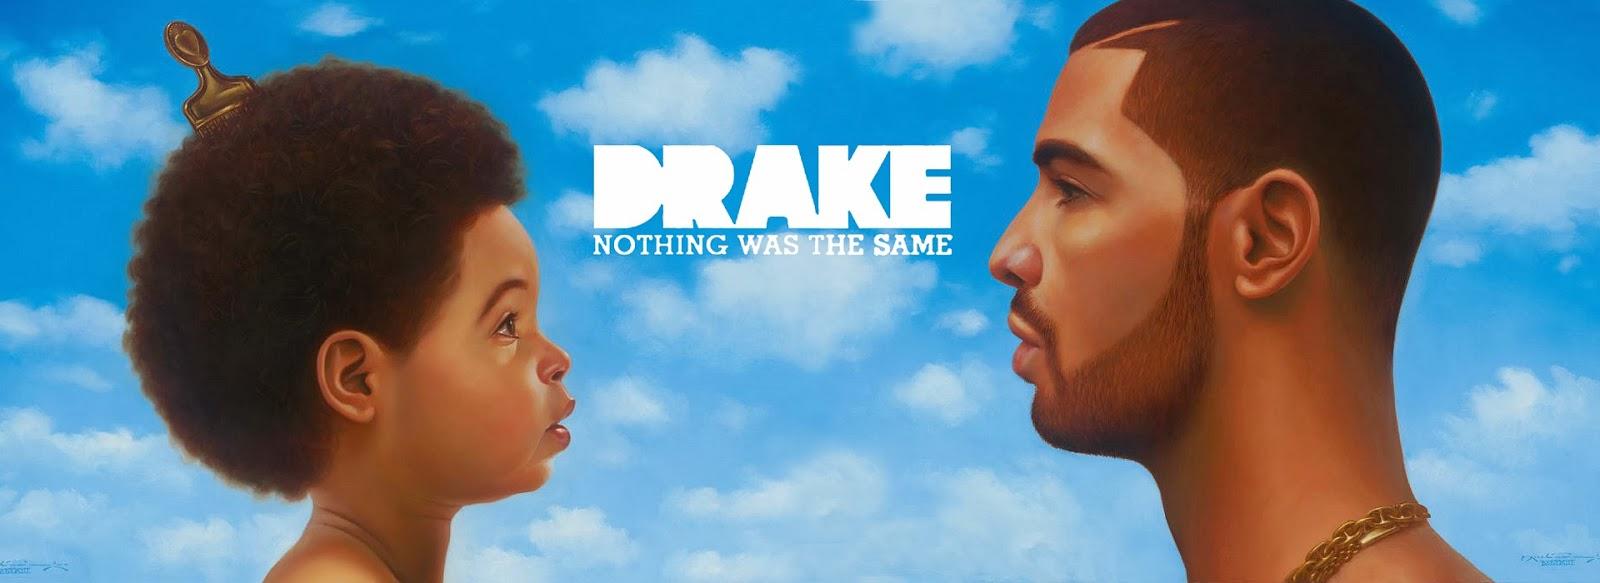 Drake Nothing Was The Same Wallpaper | Pics | Download |